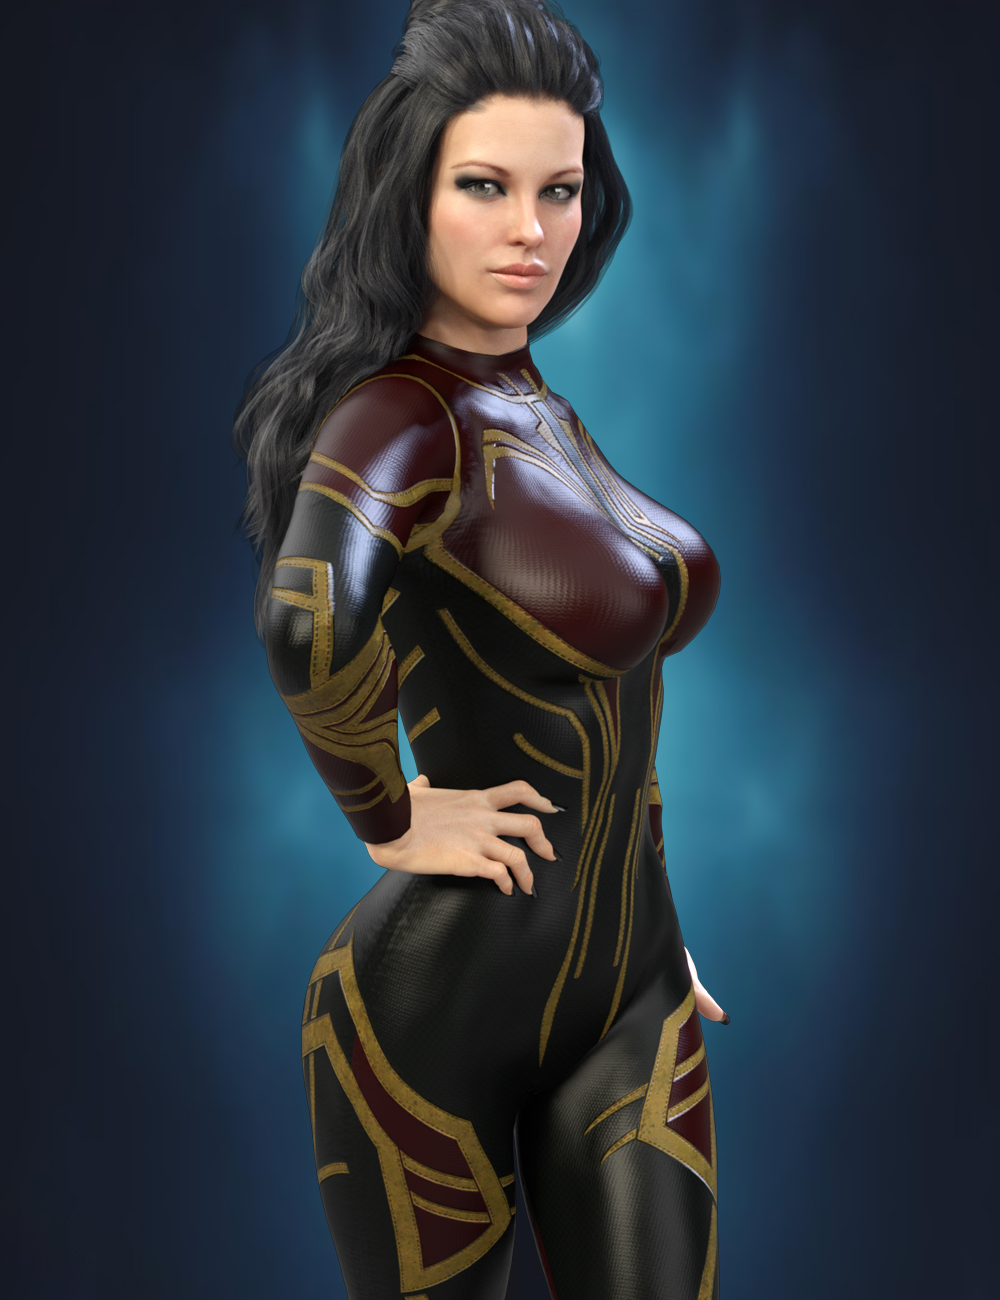 X-Fashion Sci Bodysuit for Genesis 8 Female(s) by: xtrart-3d, 3D Models by Daz 3D